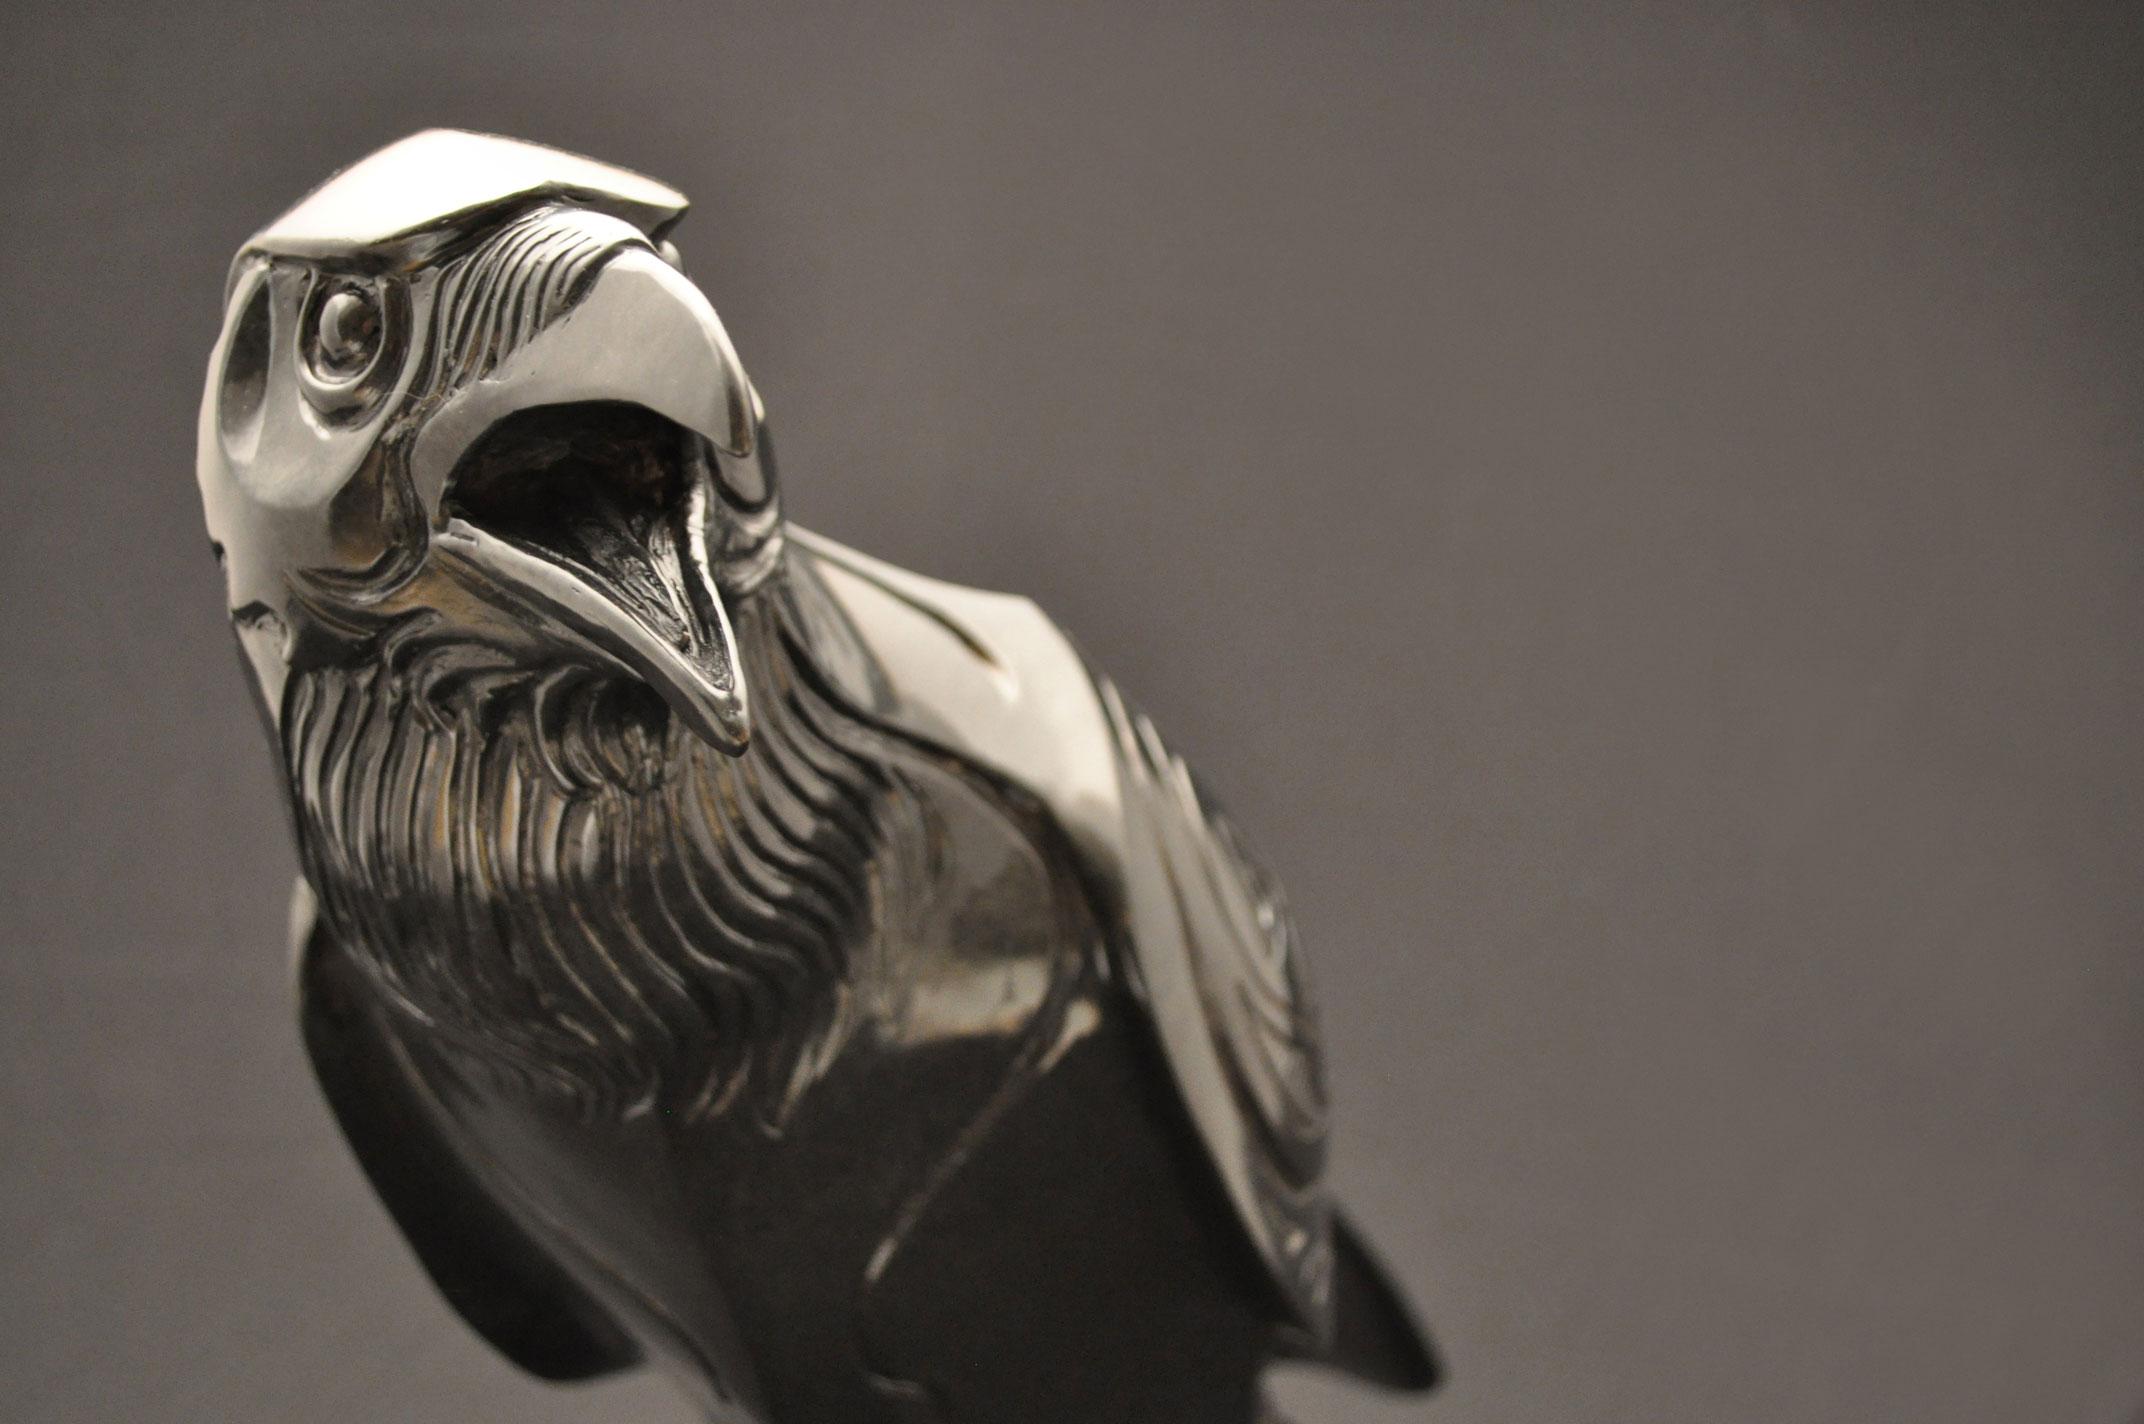 Raven-Sculpture-Bronze-John-Maisano---8.jpg